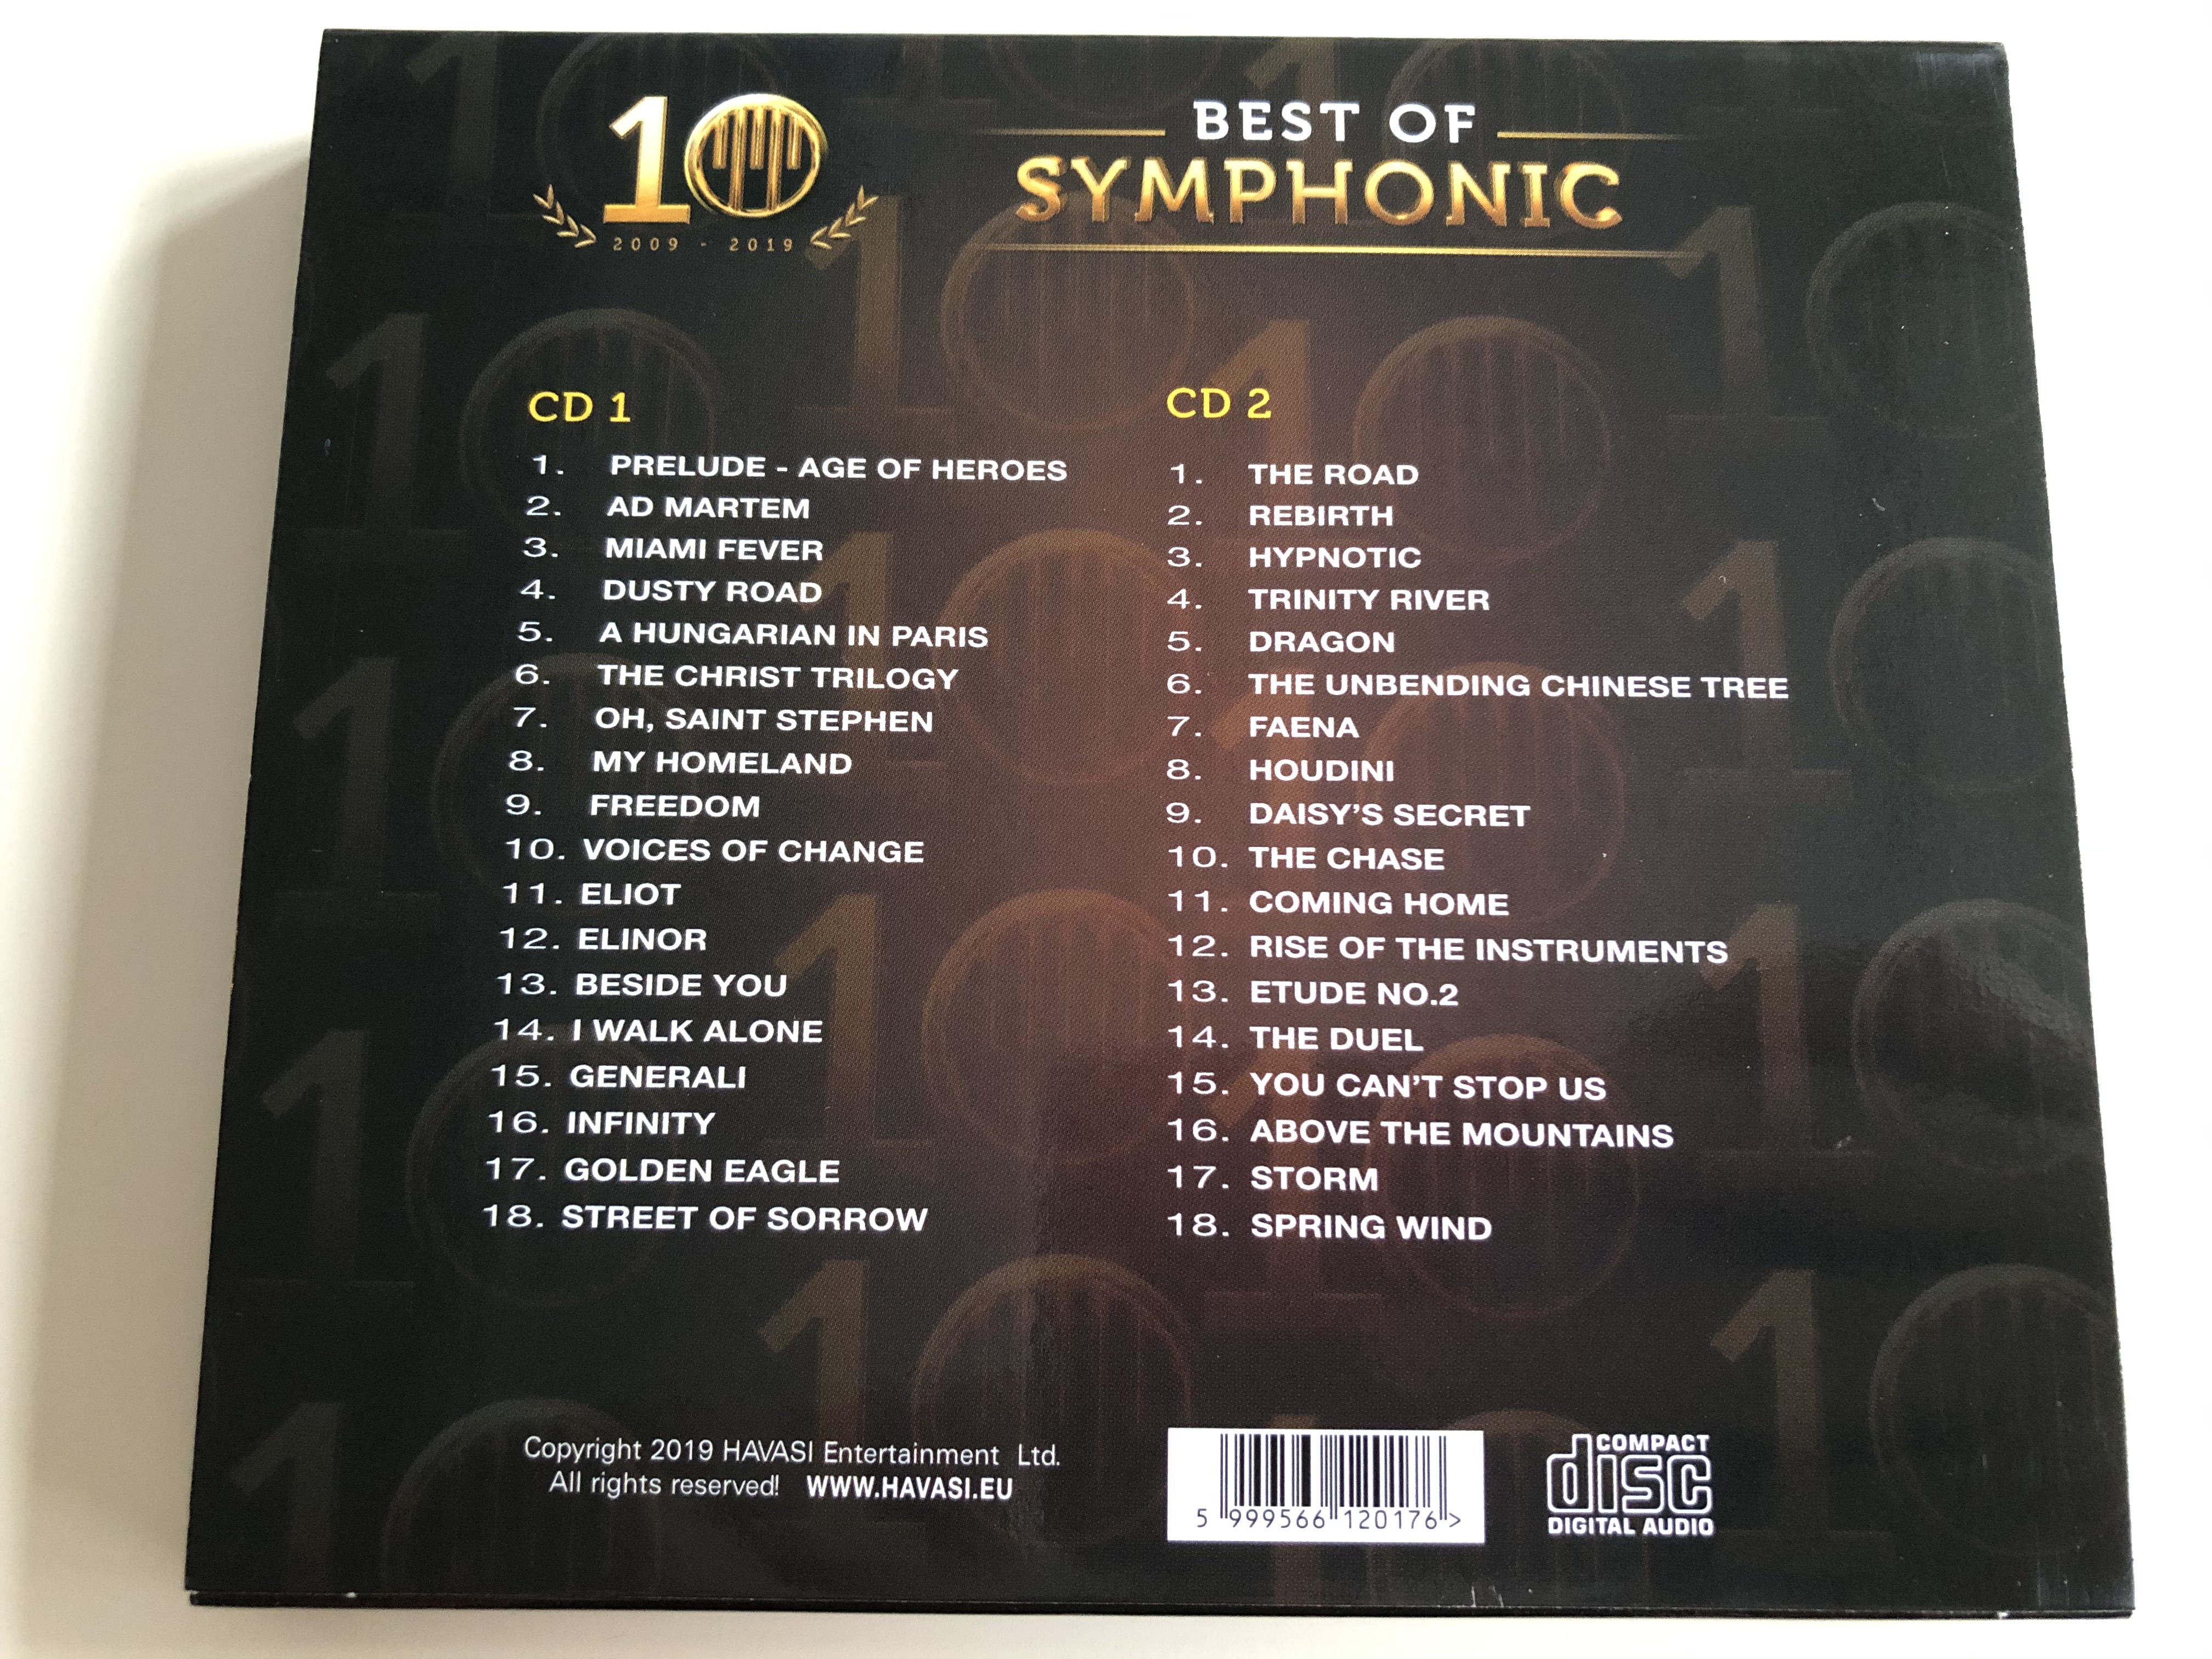 10-havasi-havasi-bal-zs-10-year-anniversary-2009-2019-best-of-symphonic-2cd-collector-s-edition-2-.jpg